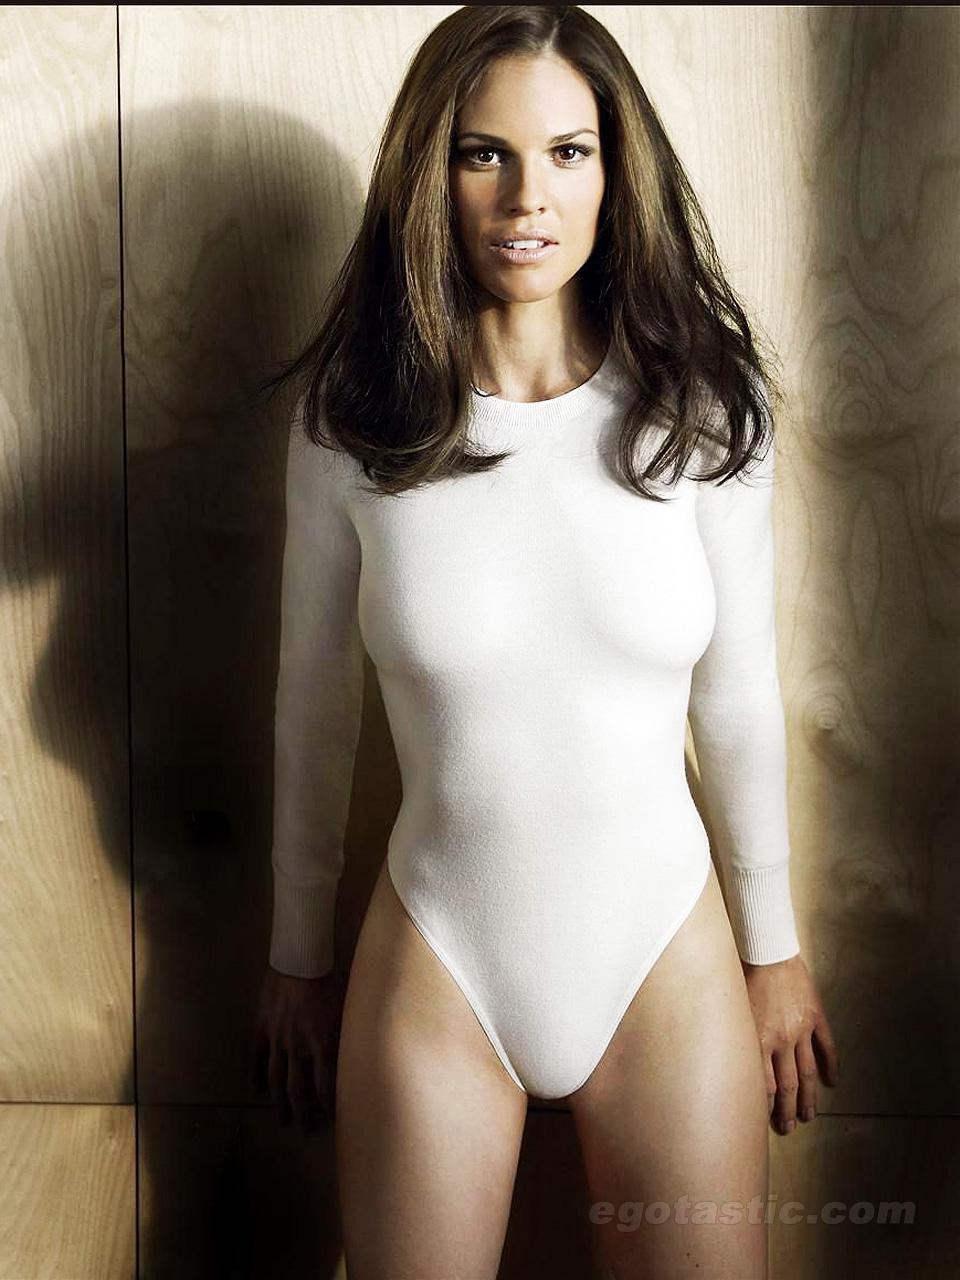 Hilary swank nudes